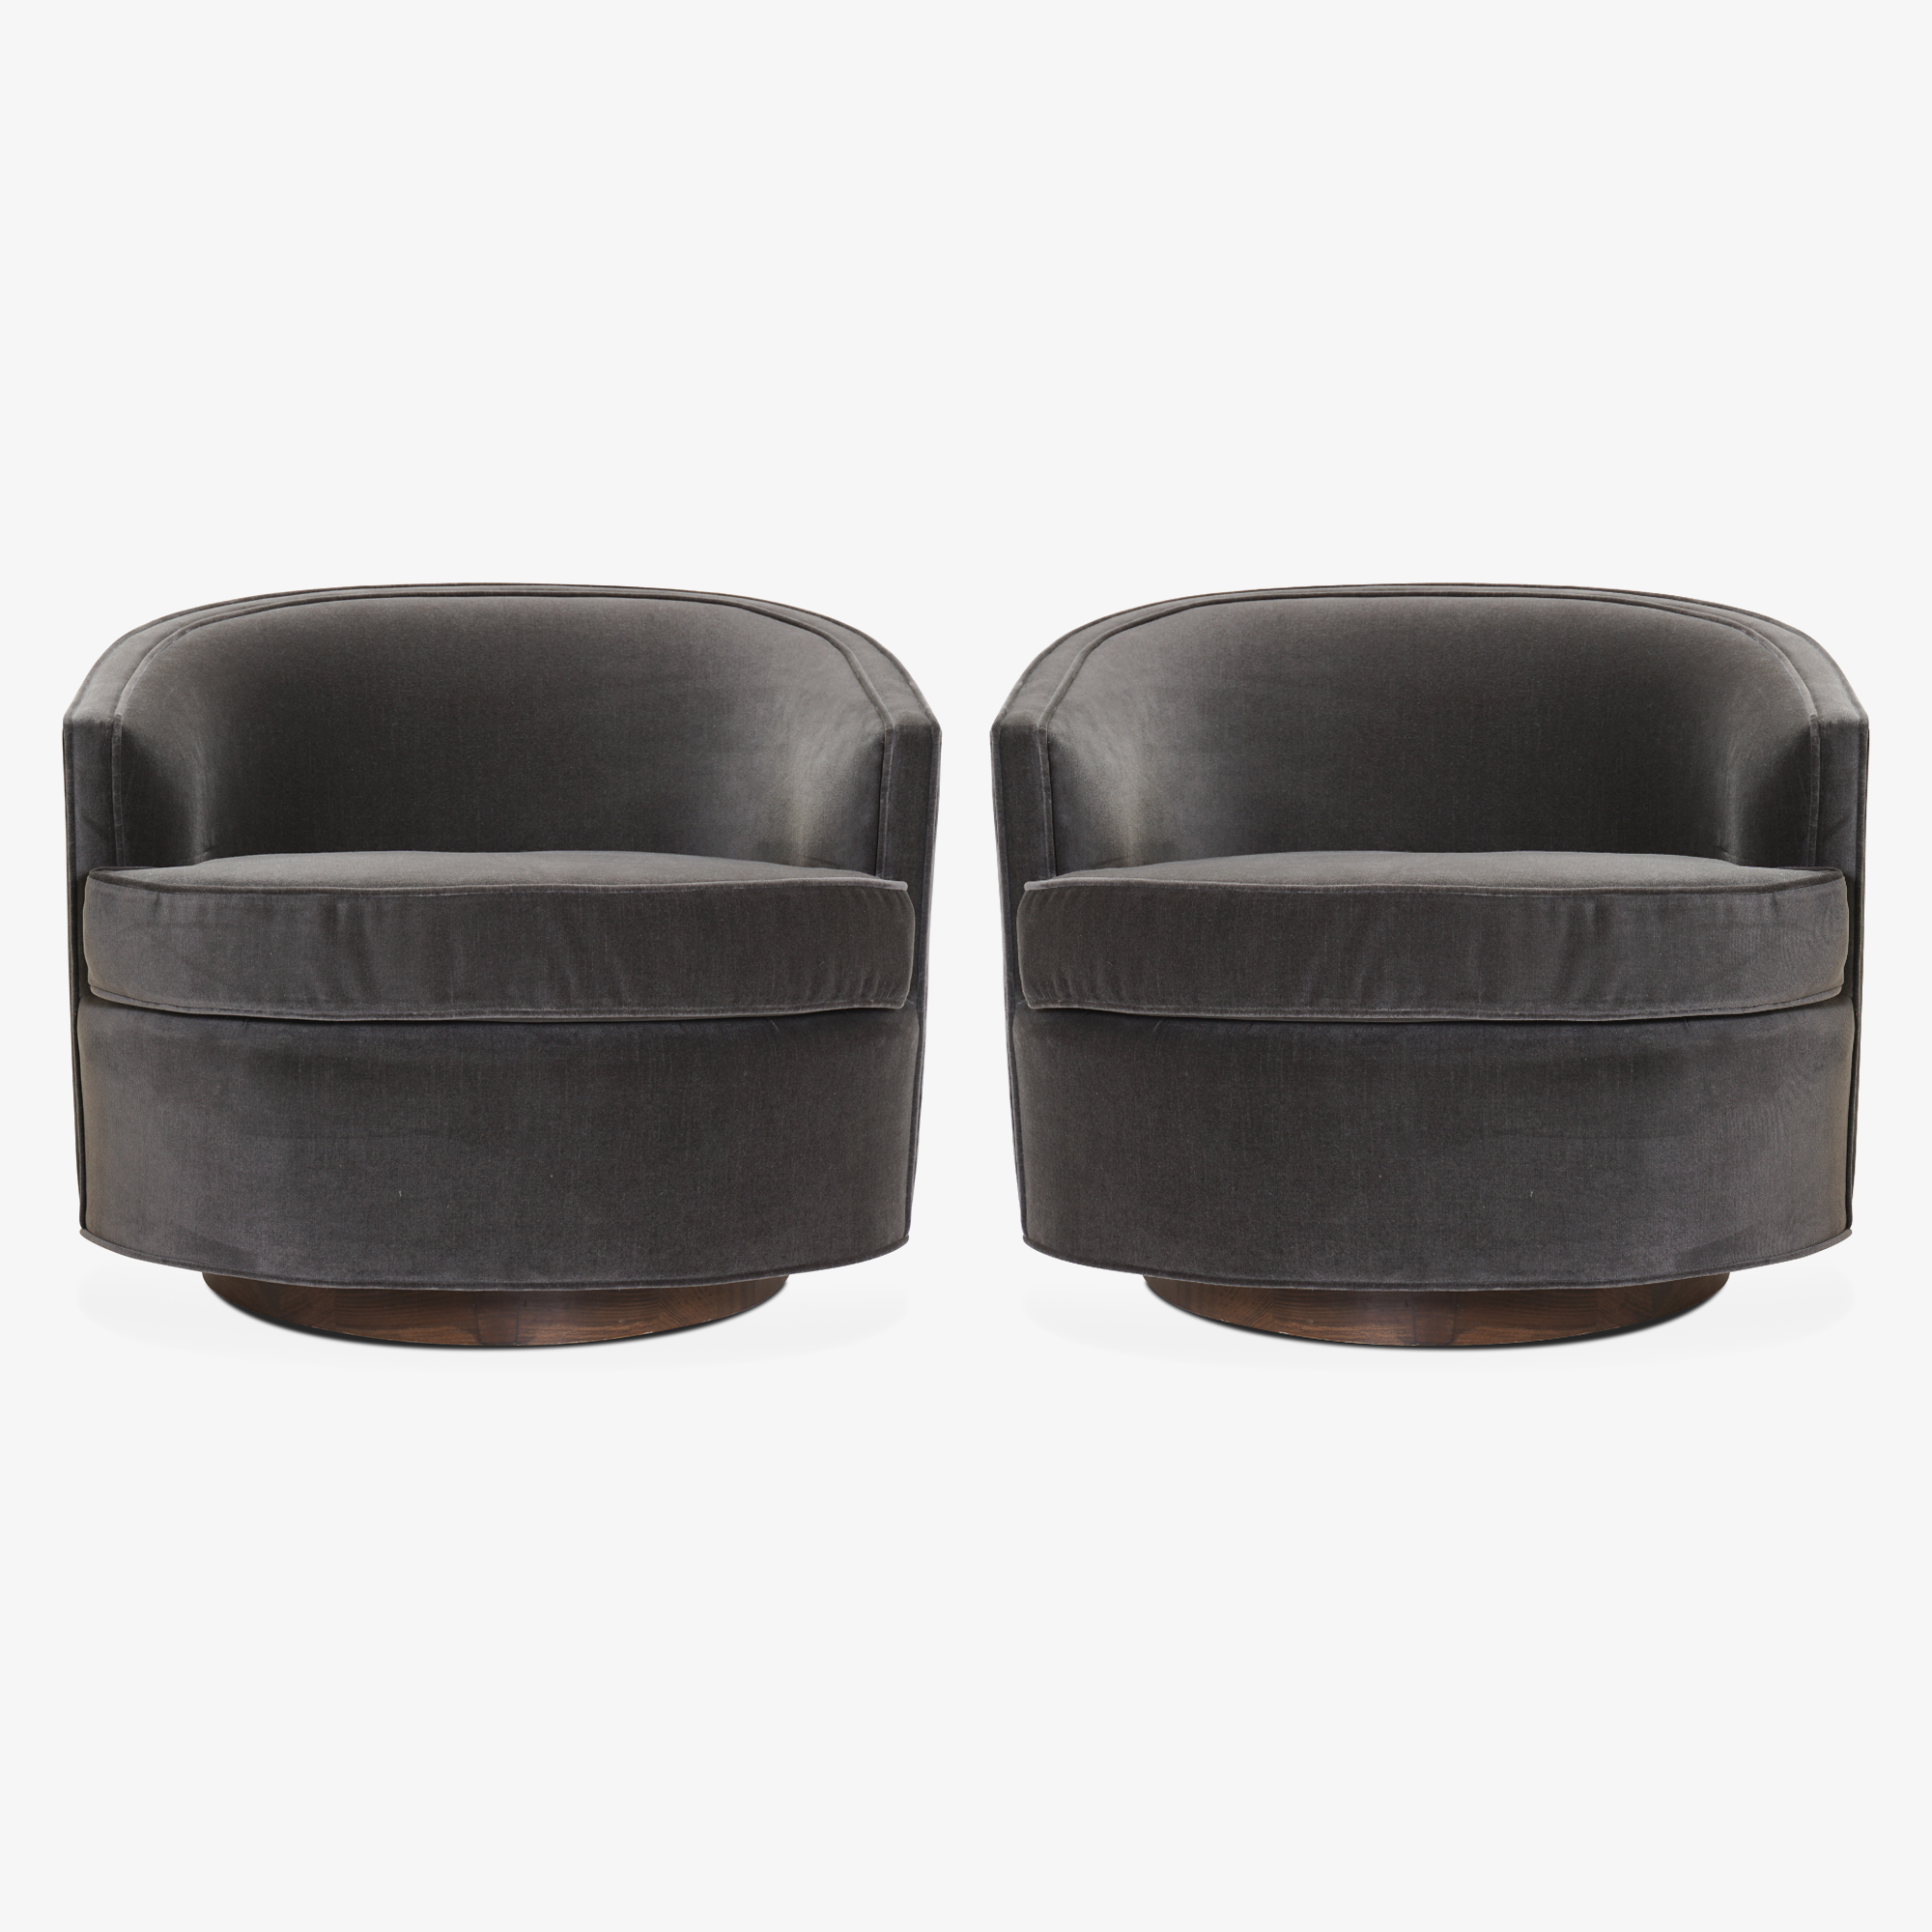 Swivel Tub Chairs in Shadow Velvet, Pair2.png